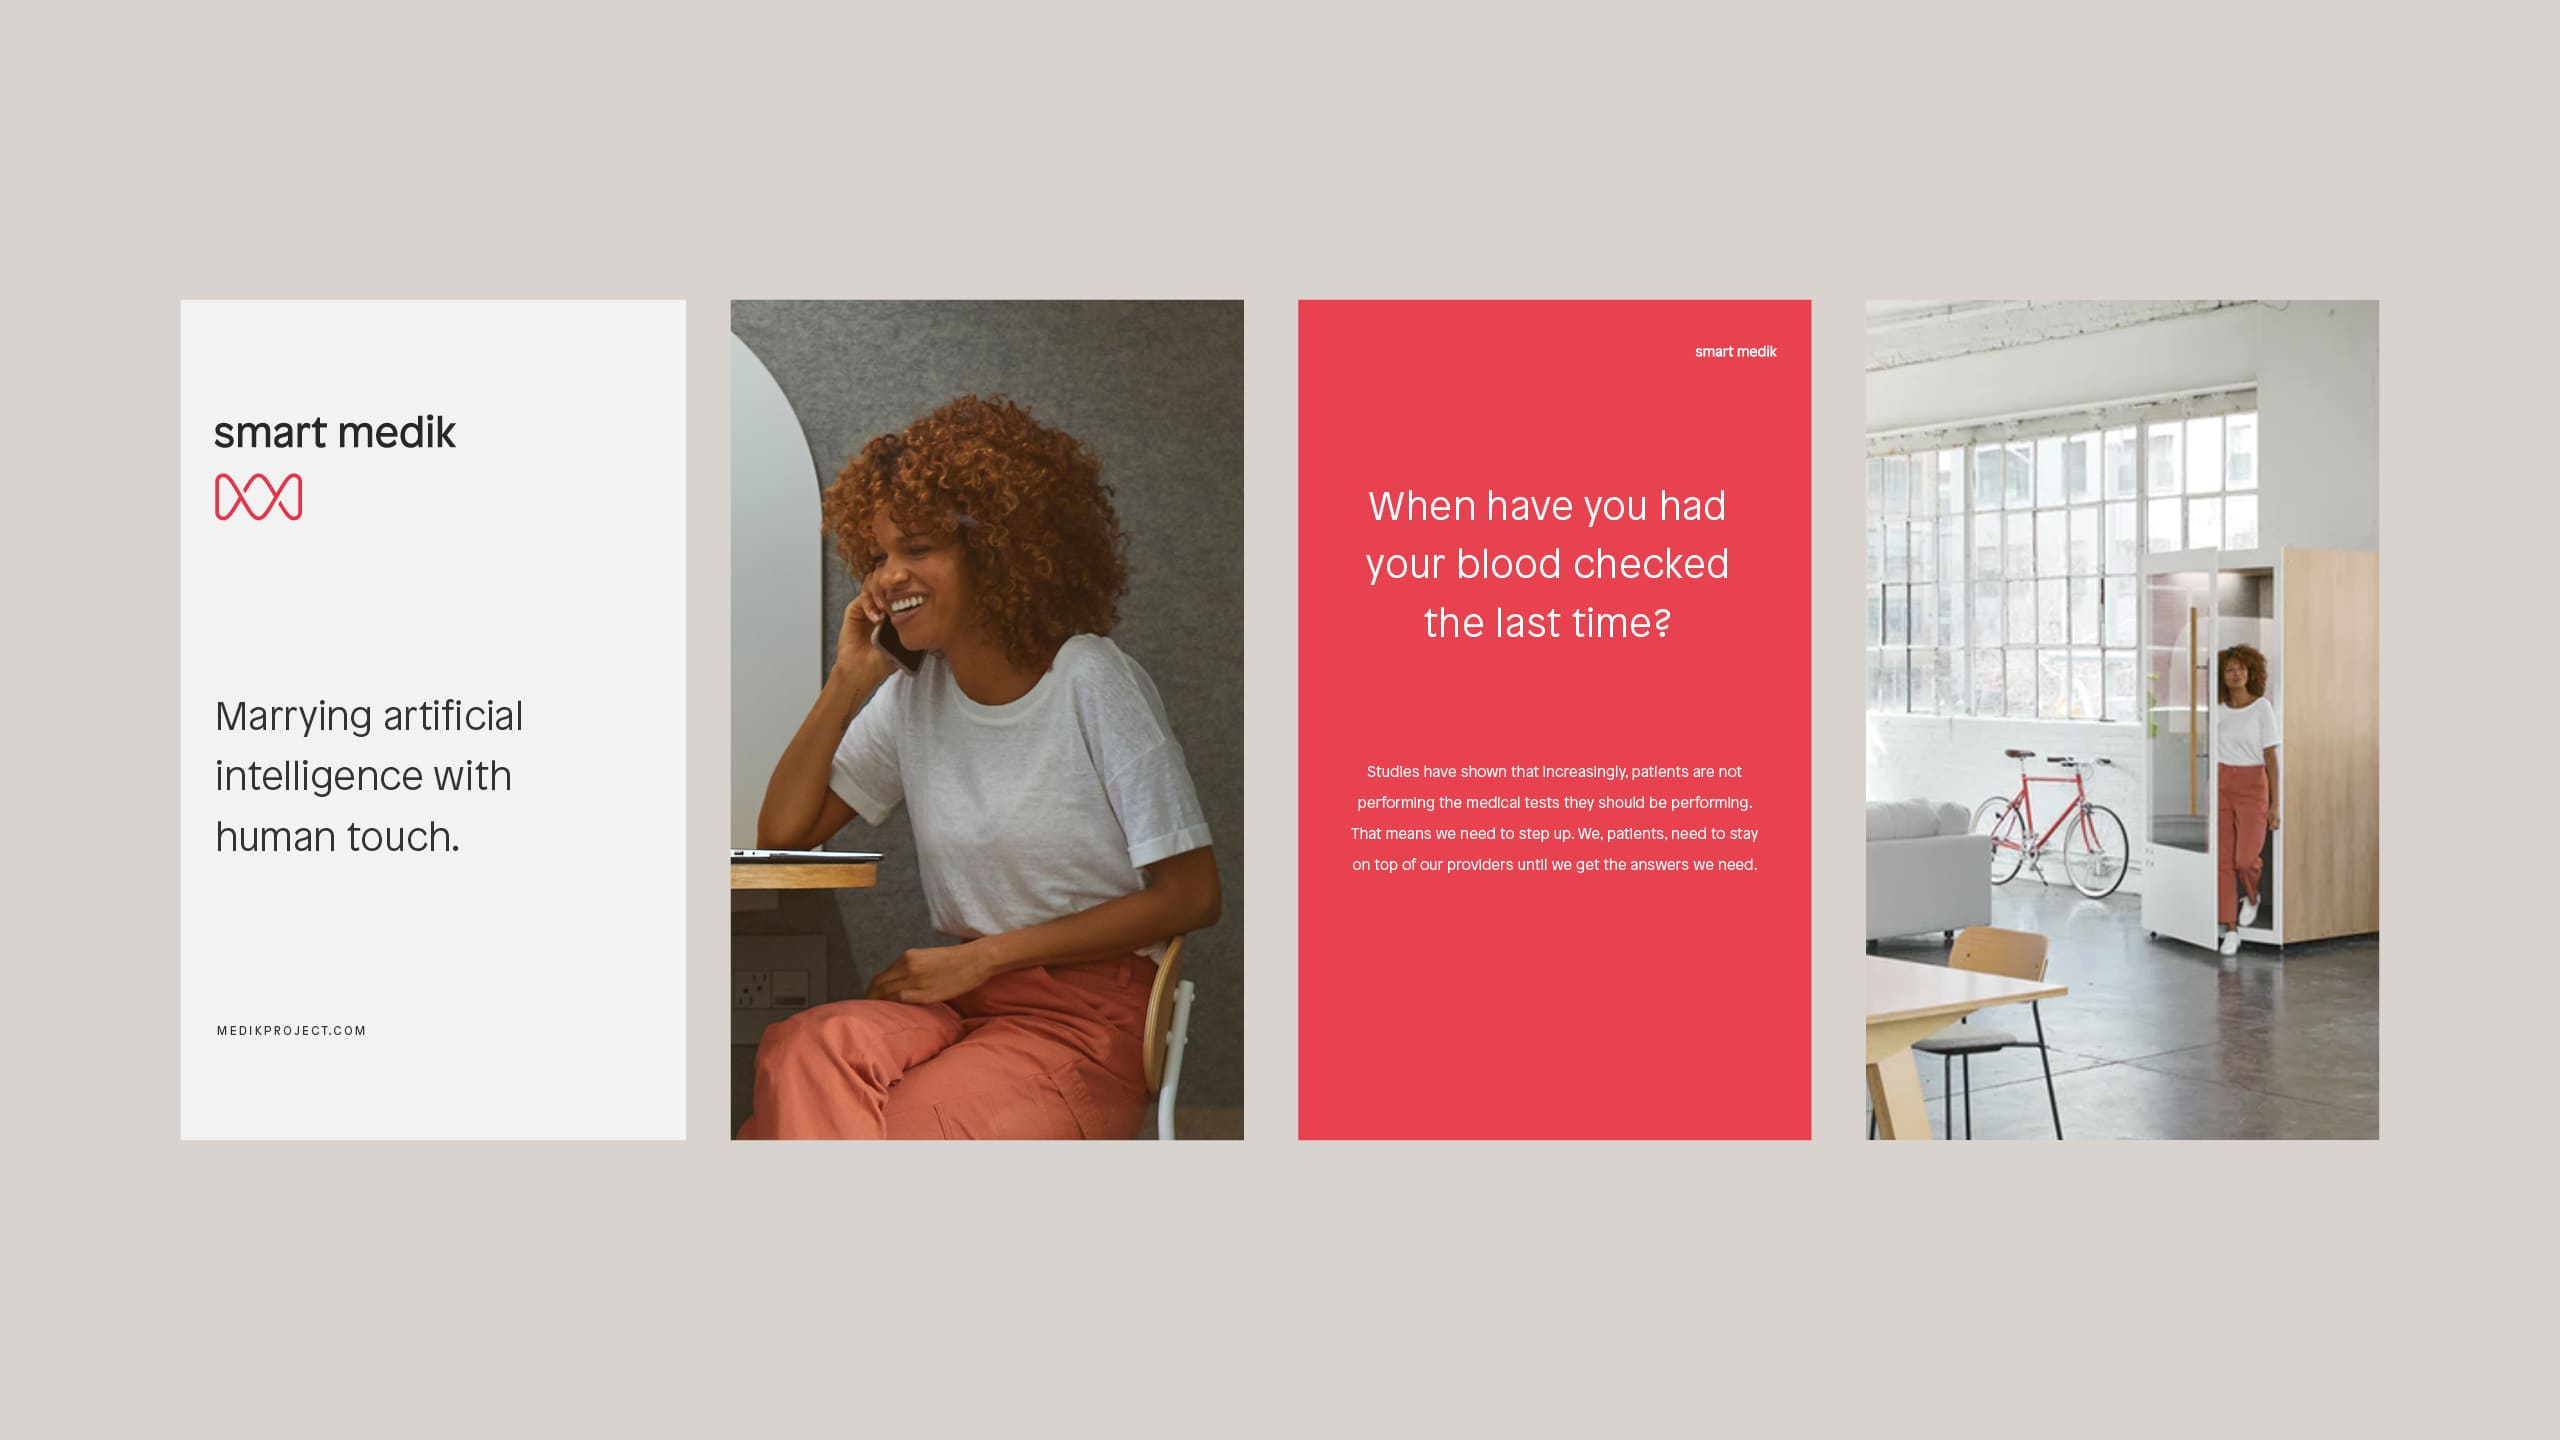 mantik-digital-branding-development-agency-creative-app-ui-web-branding-29-min-1